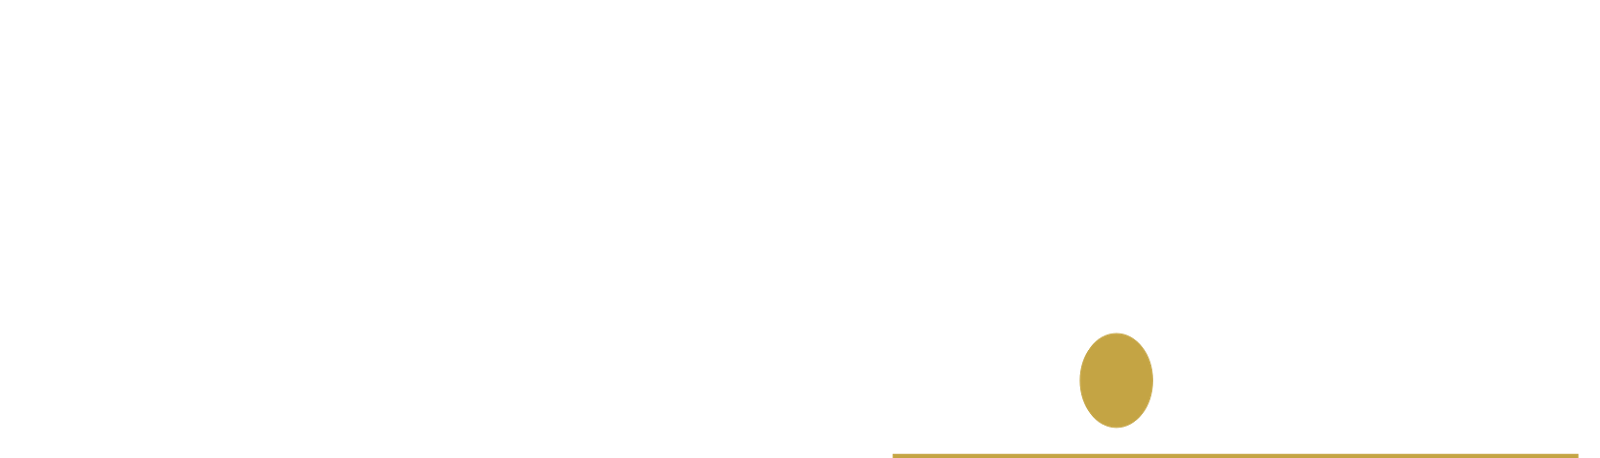 Brahmanda